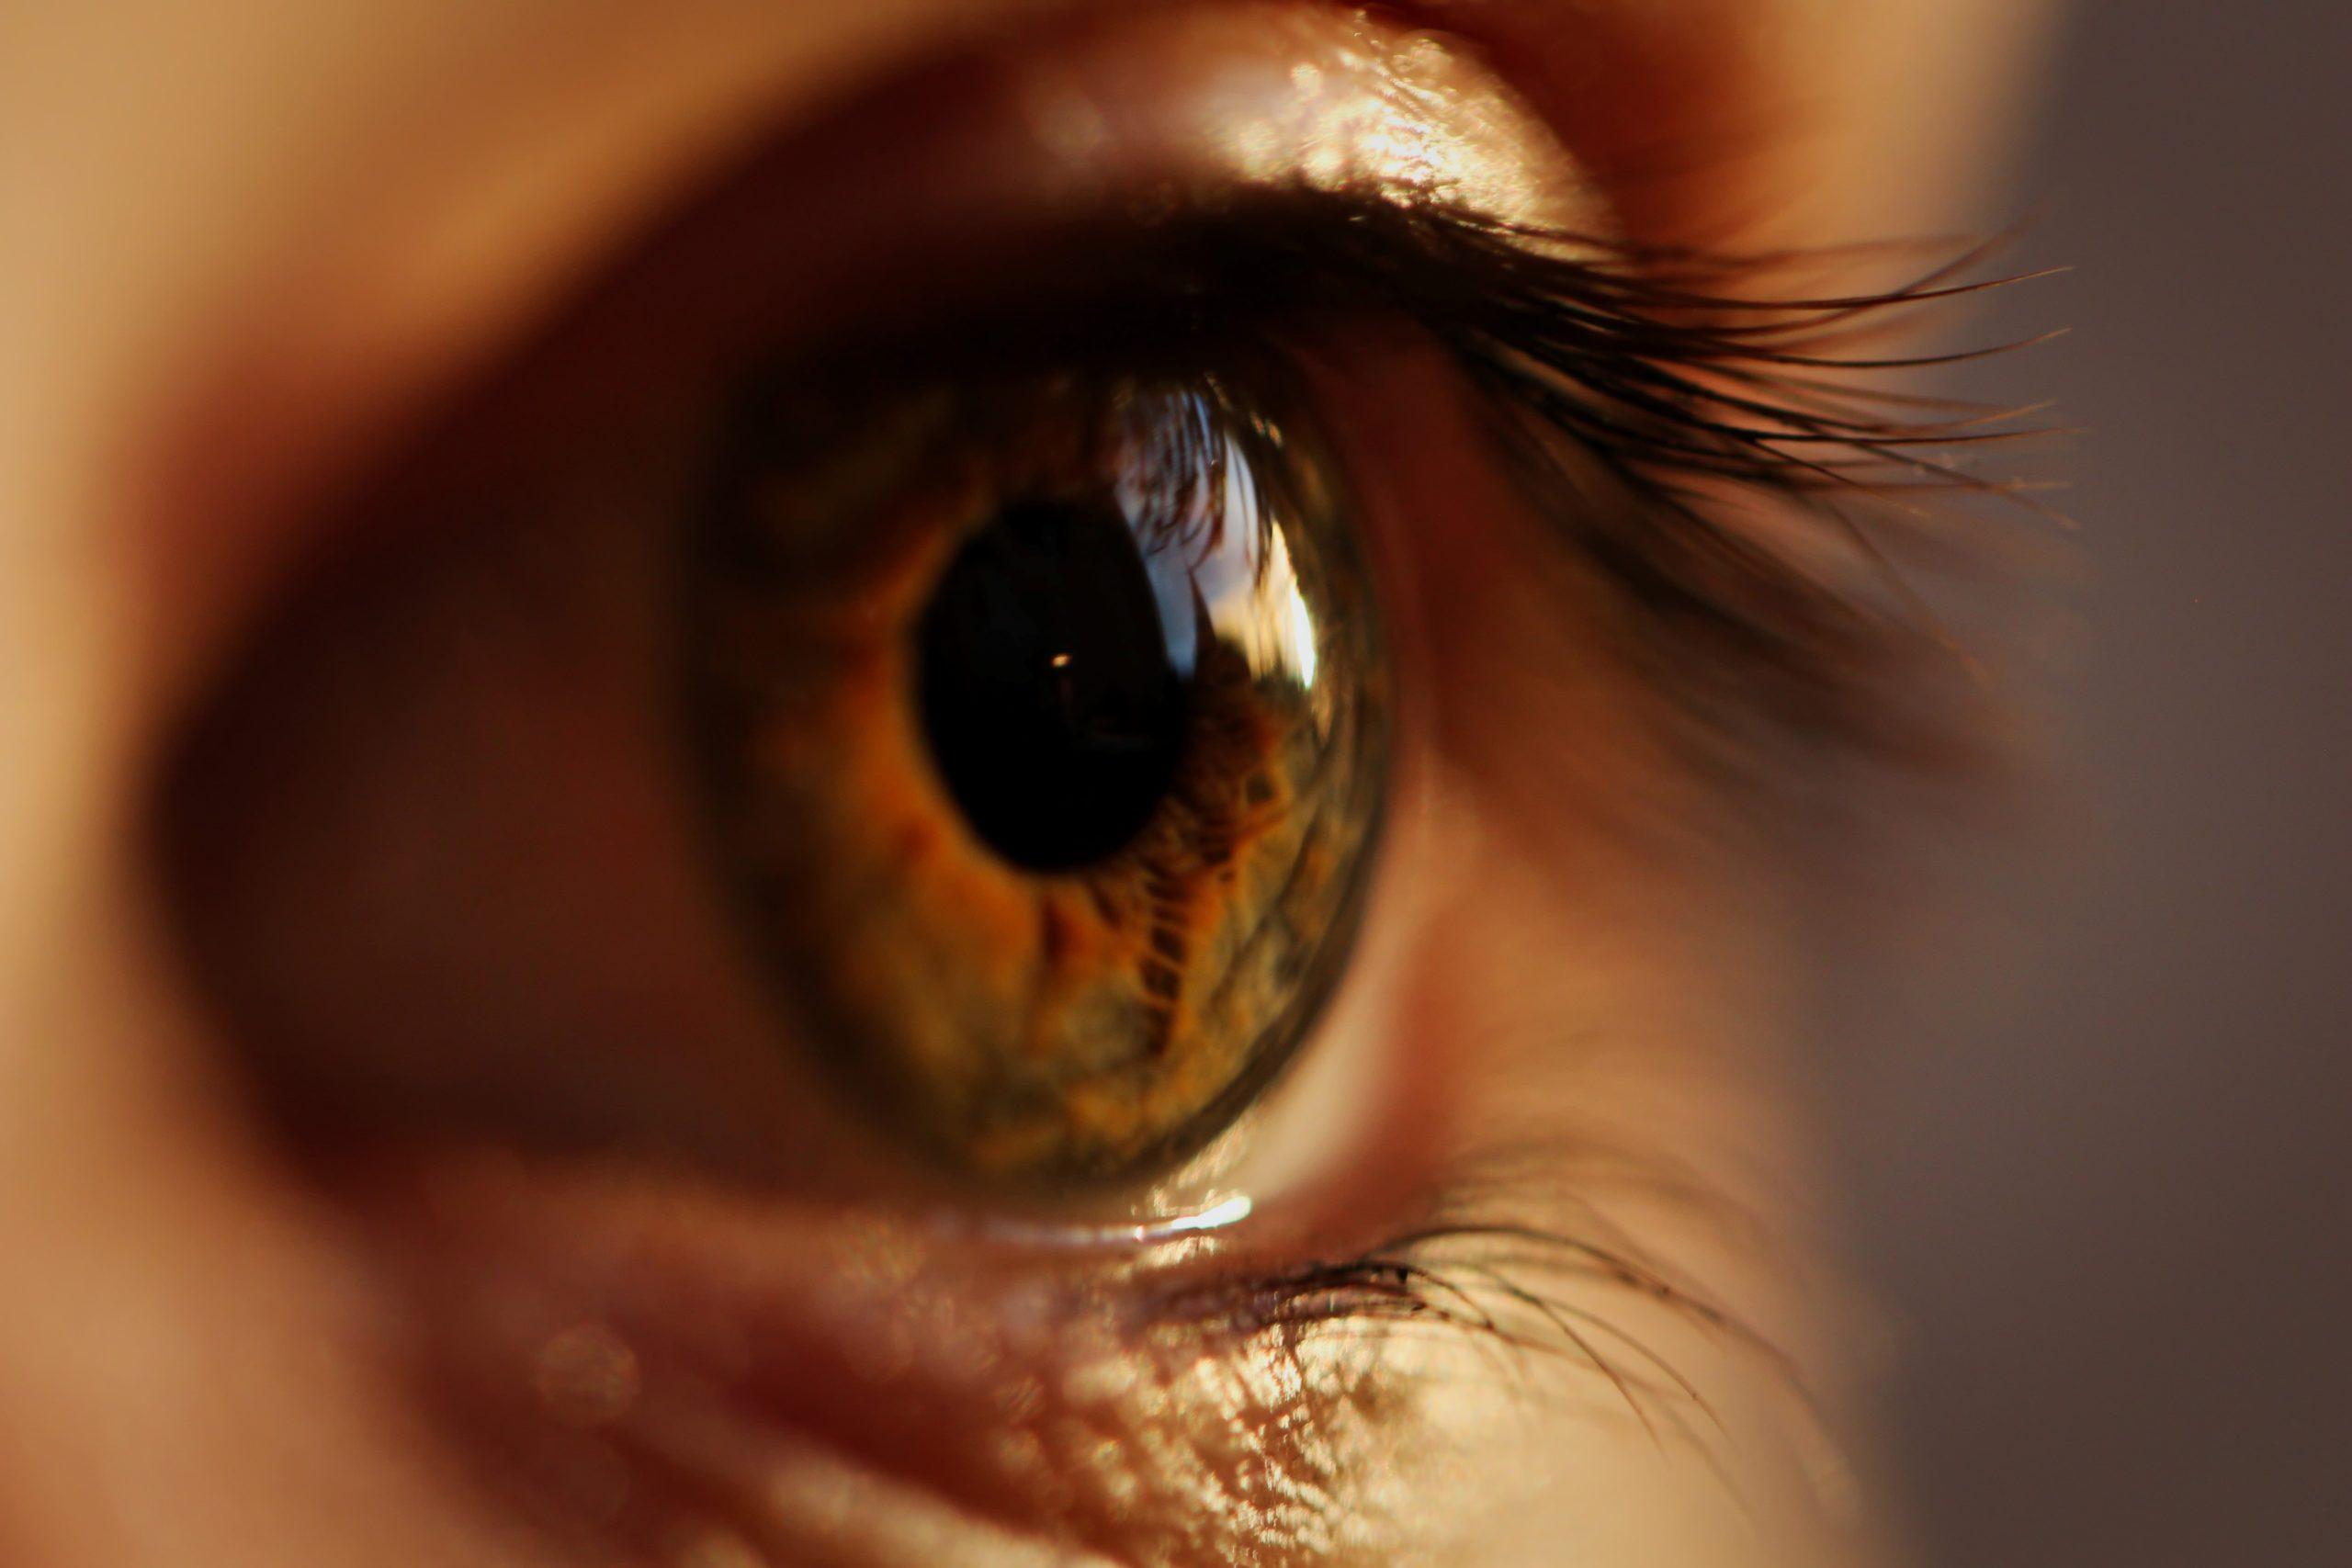 Image of eye. Marc Schulte on Unsplash